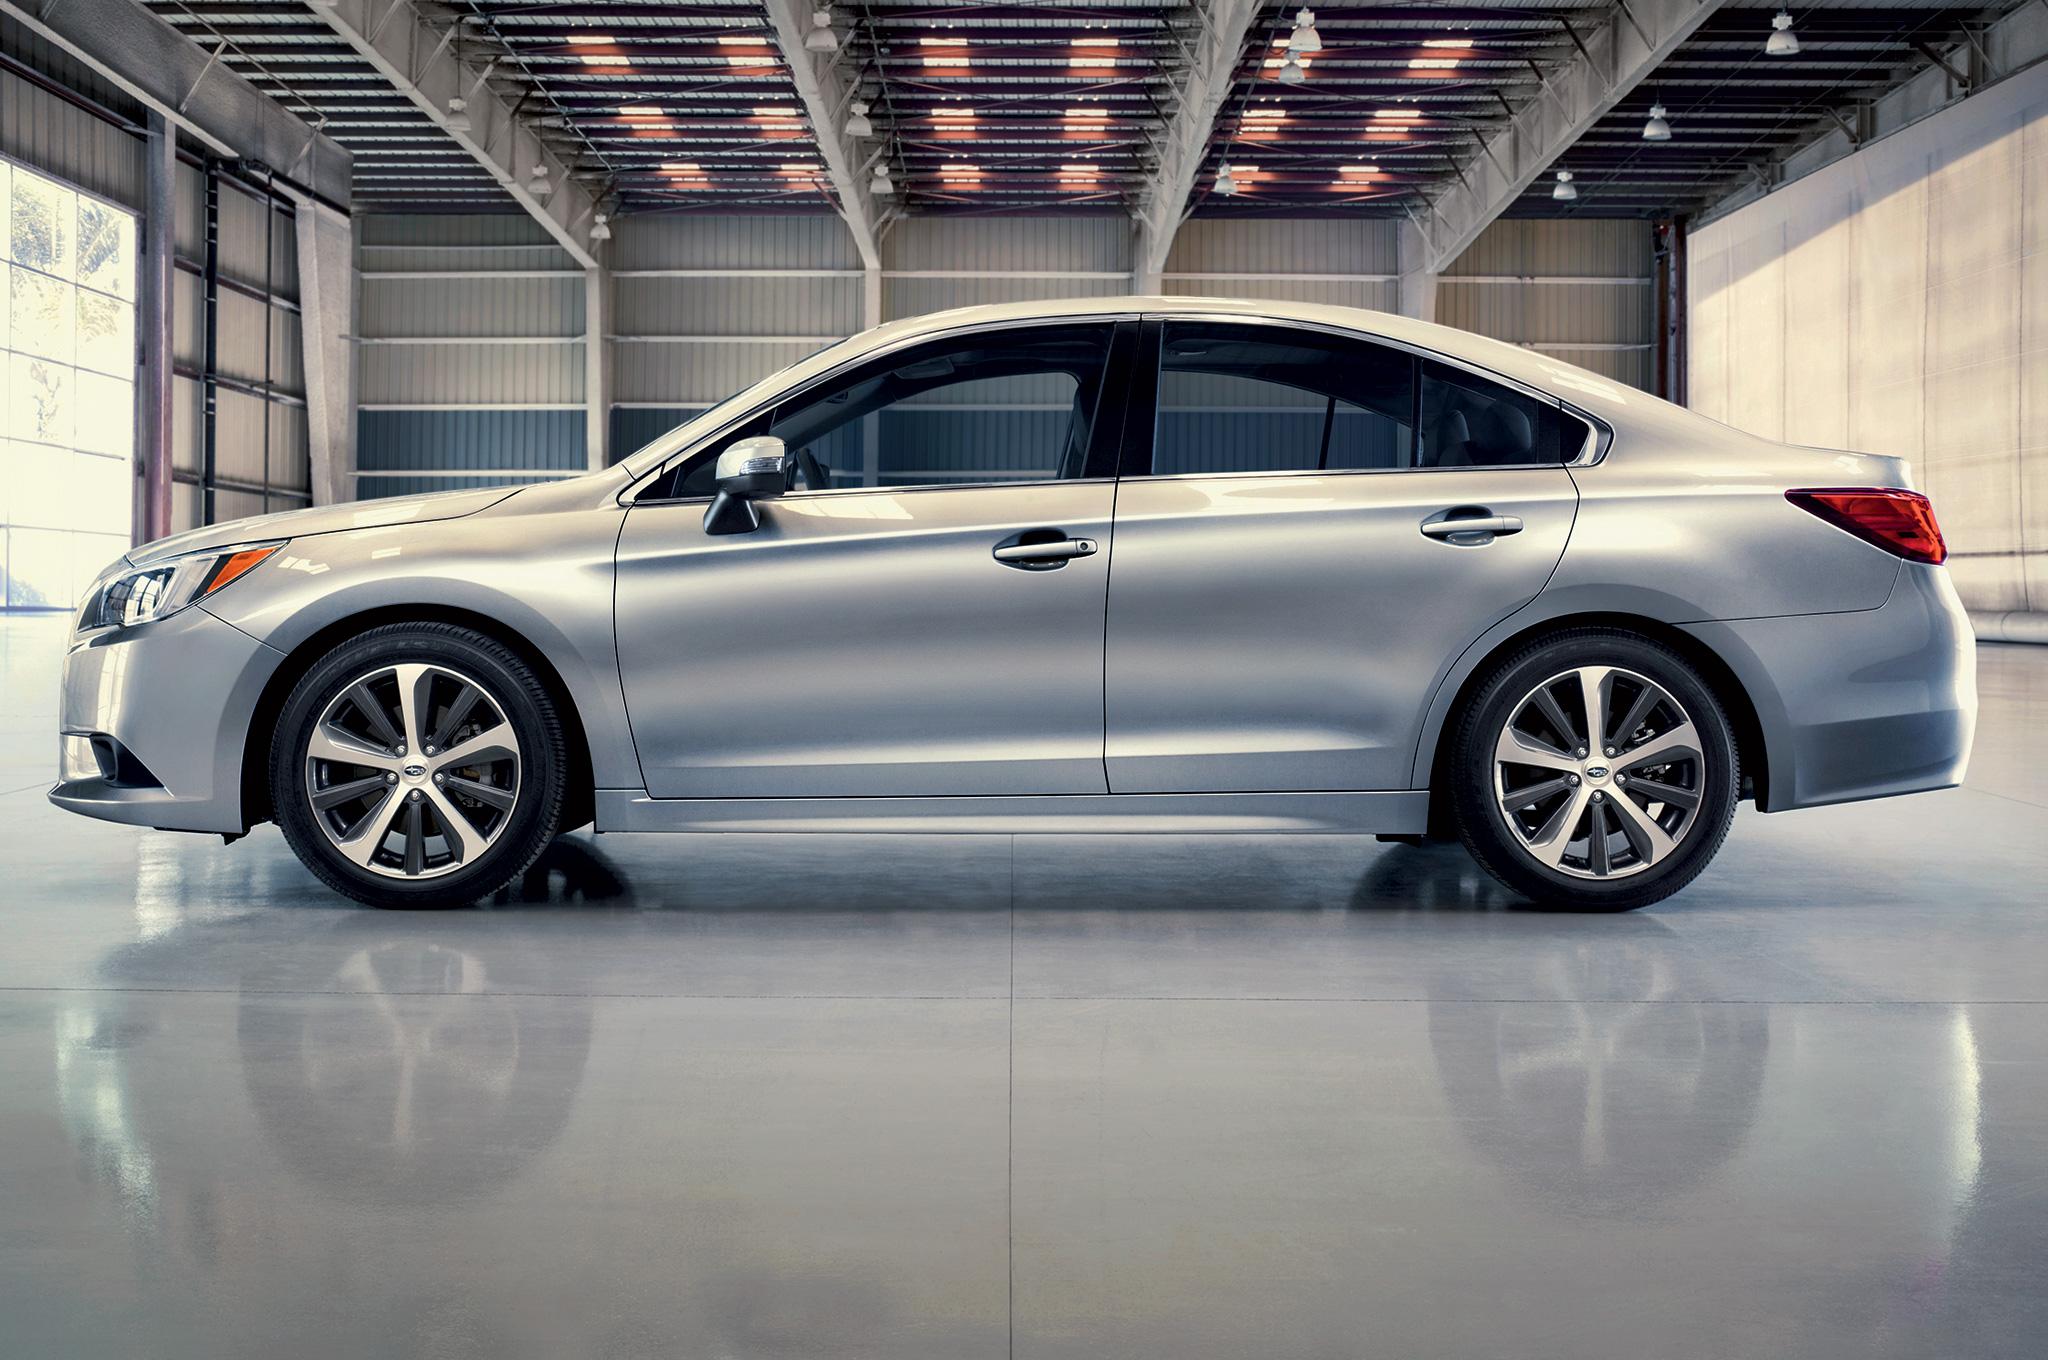 New 2015 Subaru Legacy